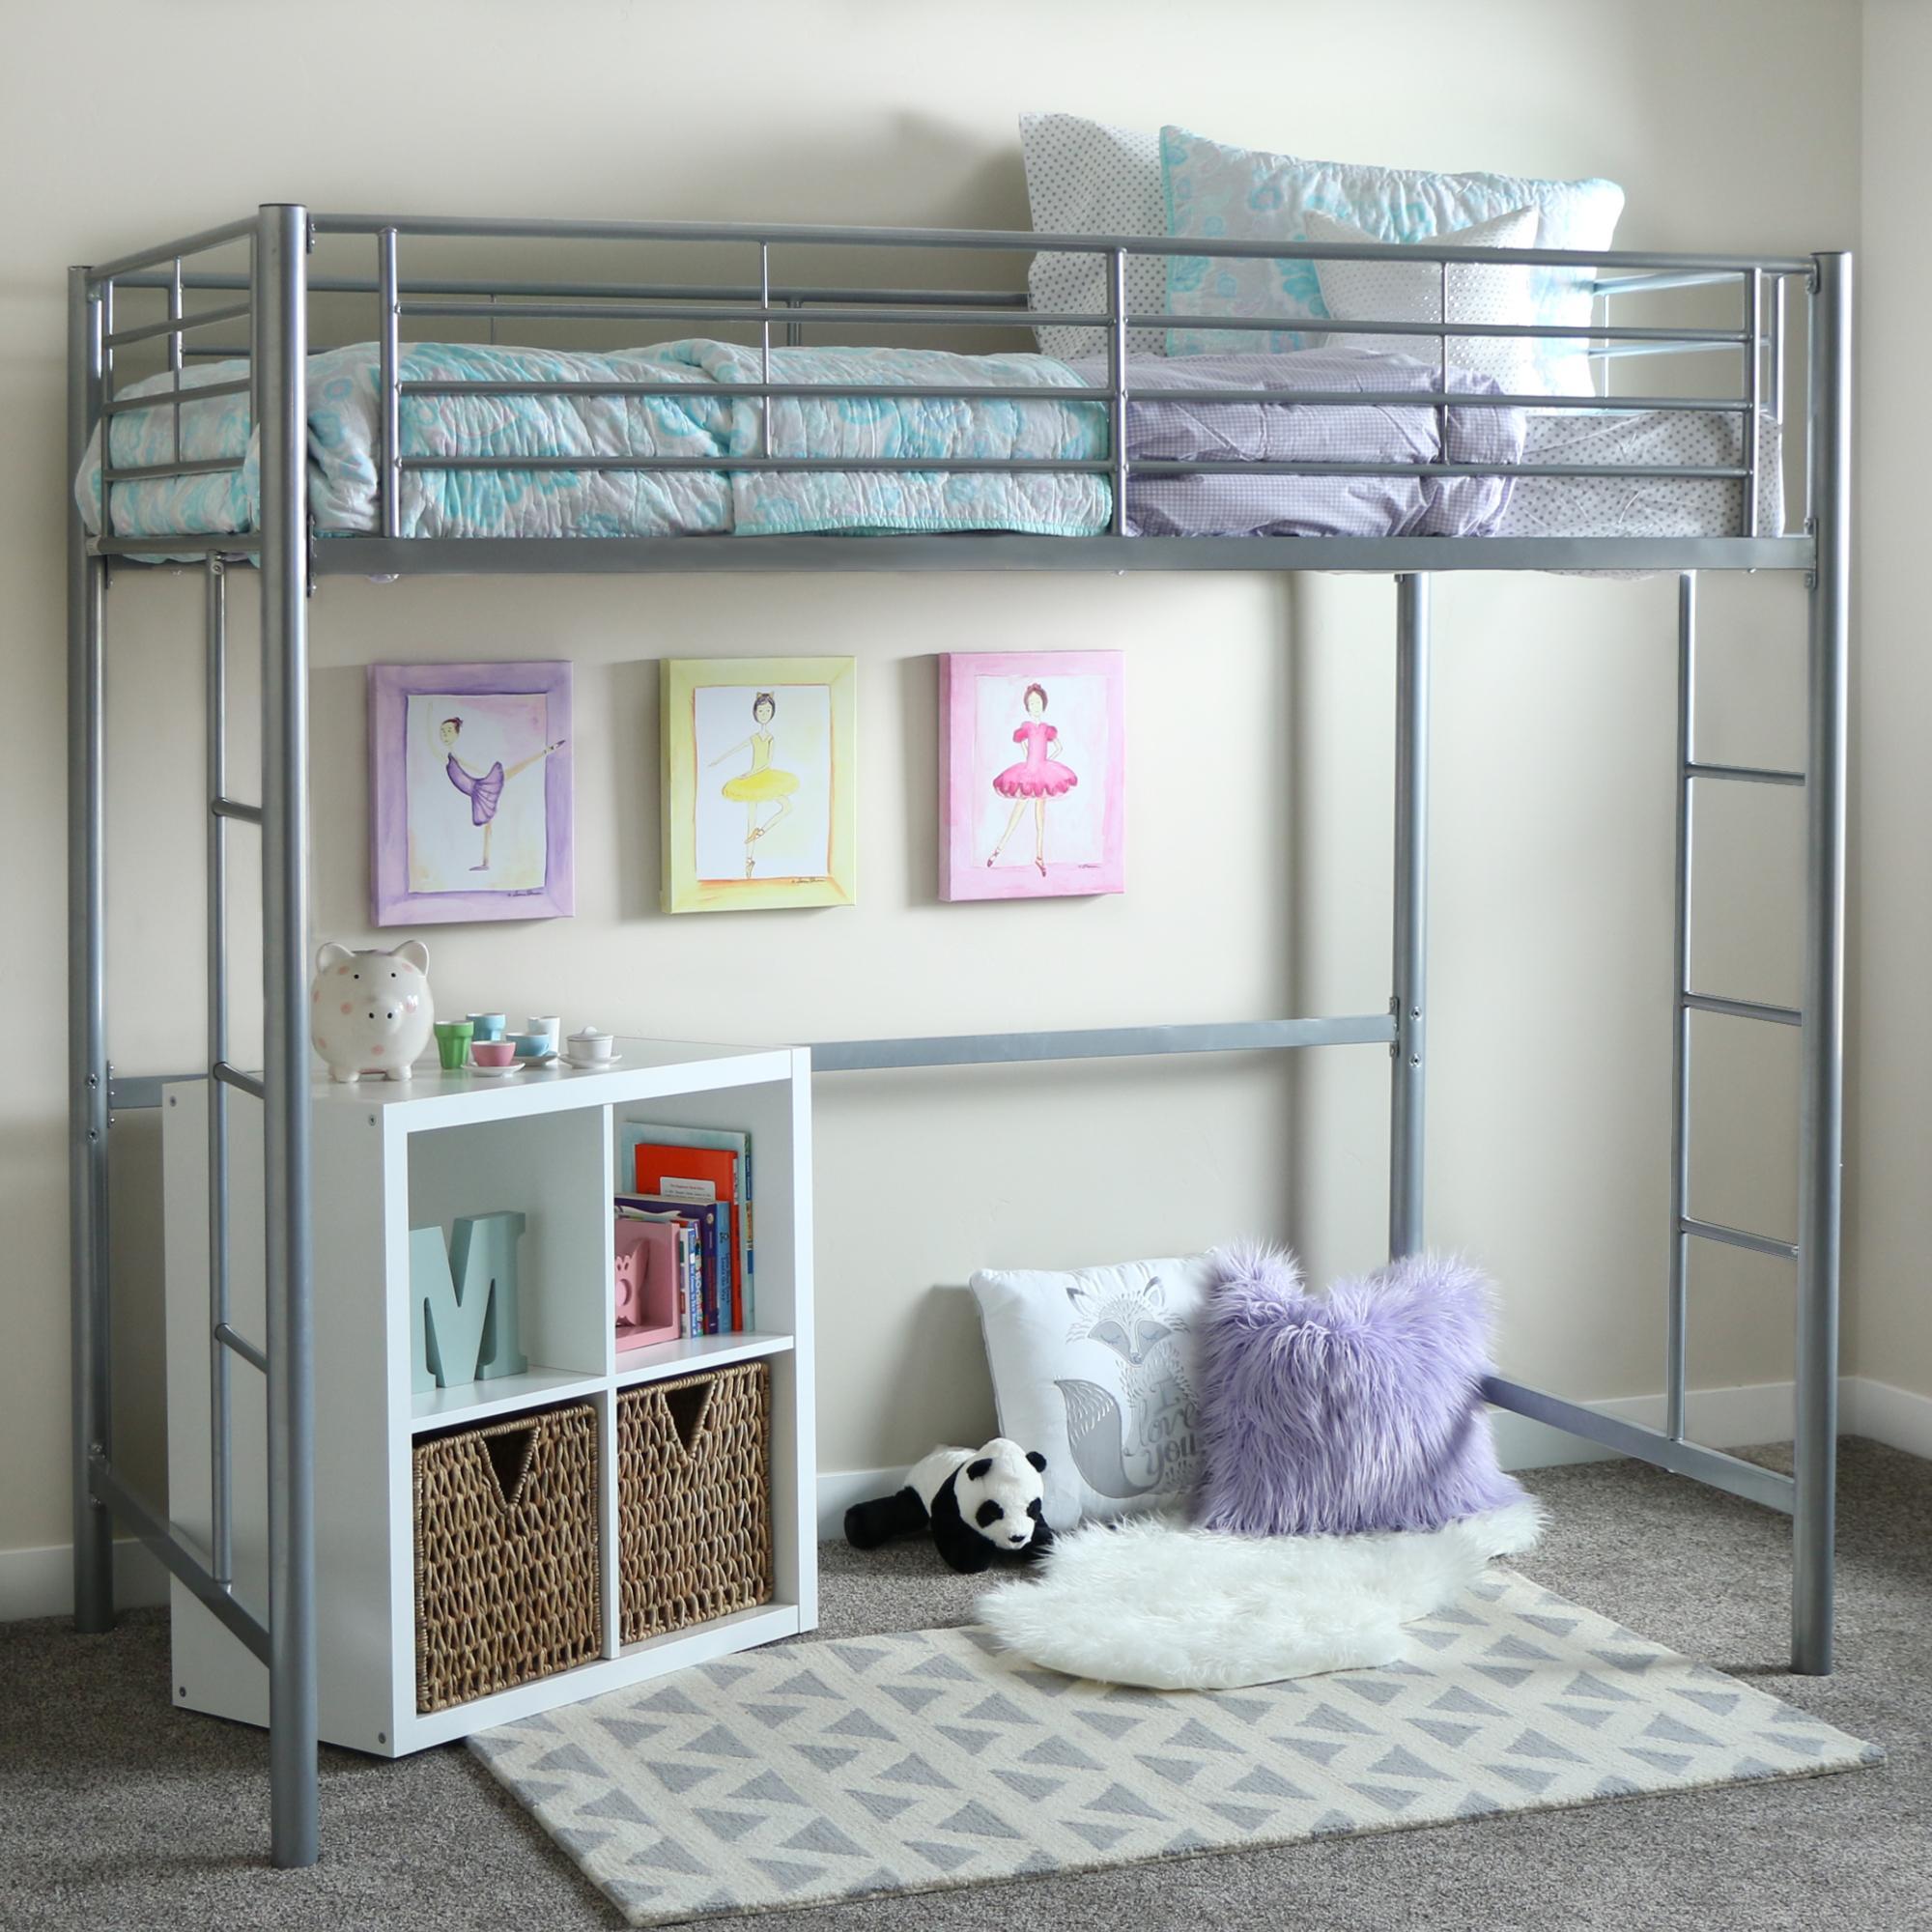 of loft bed bedroom best inspirational plans furniture ideas ceiling beds low design bunk